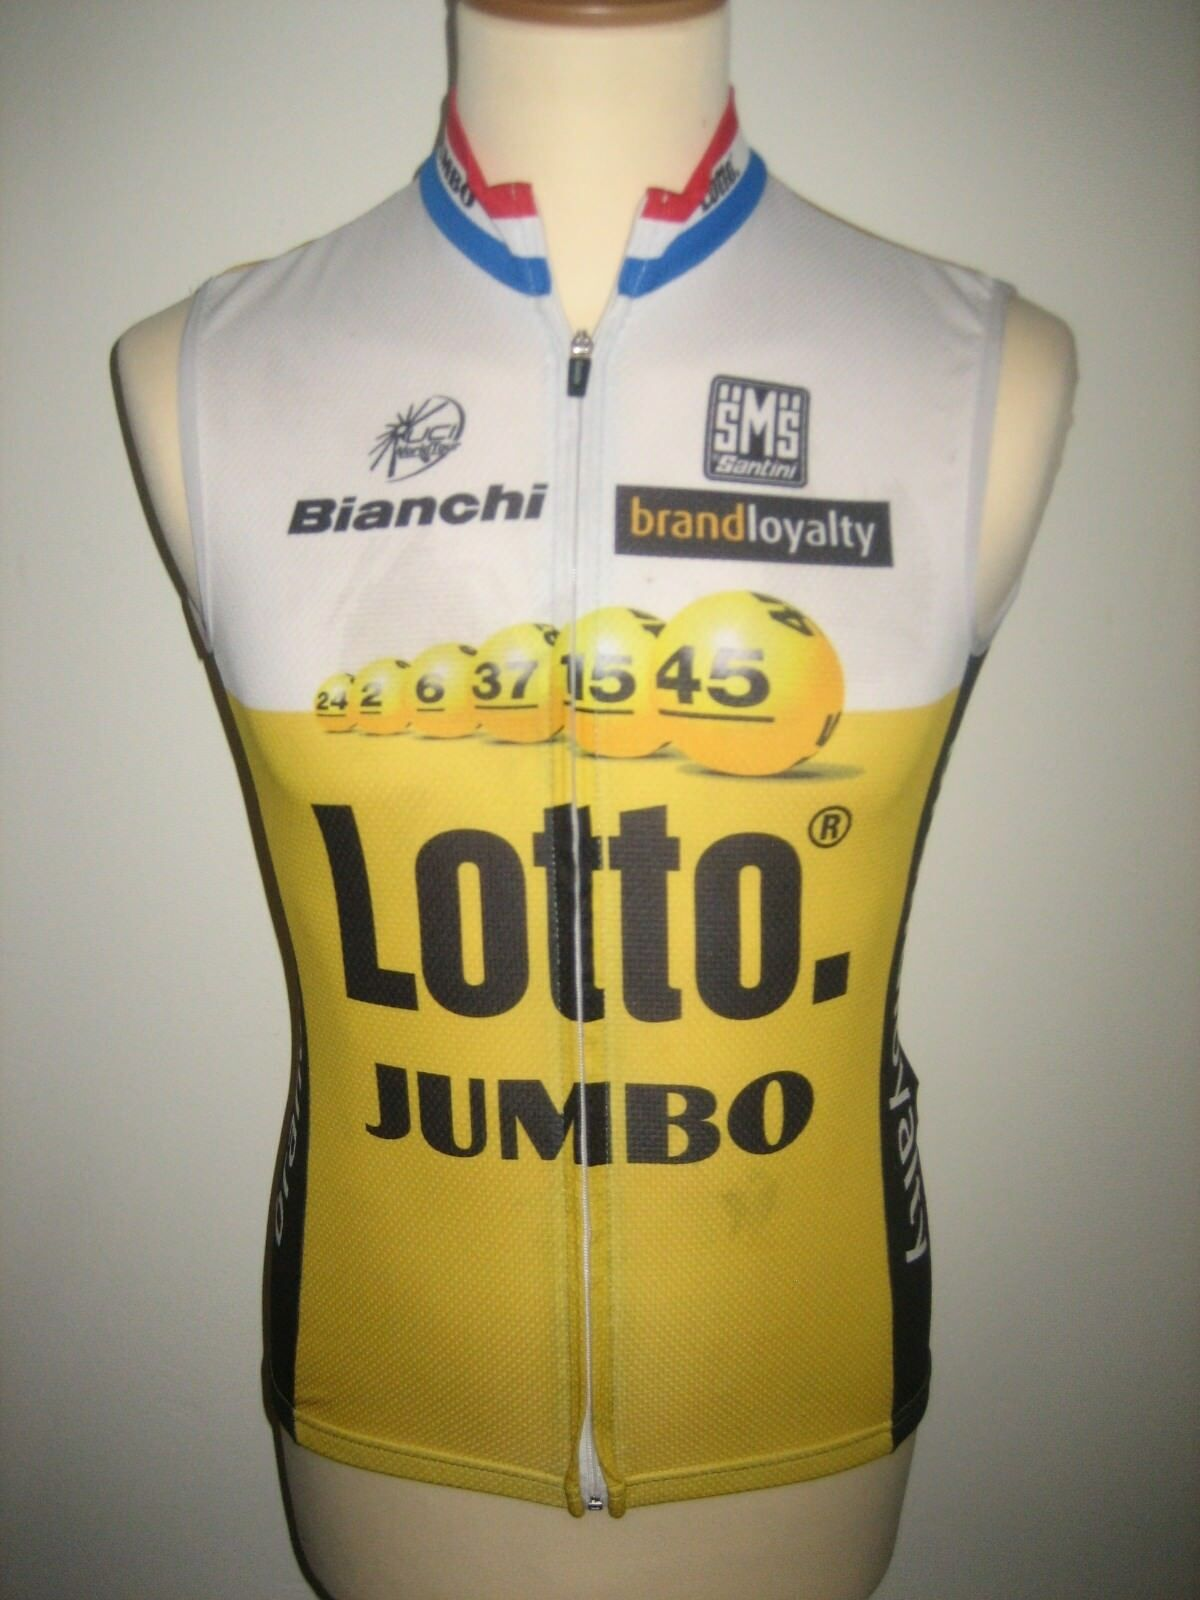 Lotto Jumbo WORN by RIDER jersey shirt cycling LottoNL maillot thermo size S